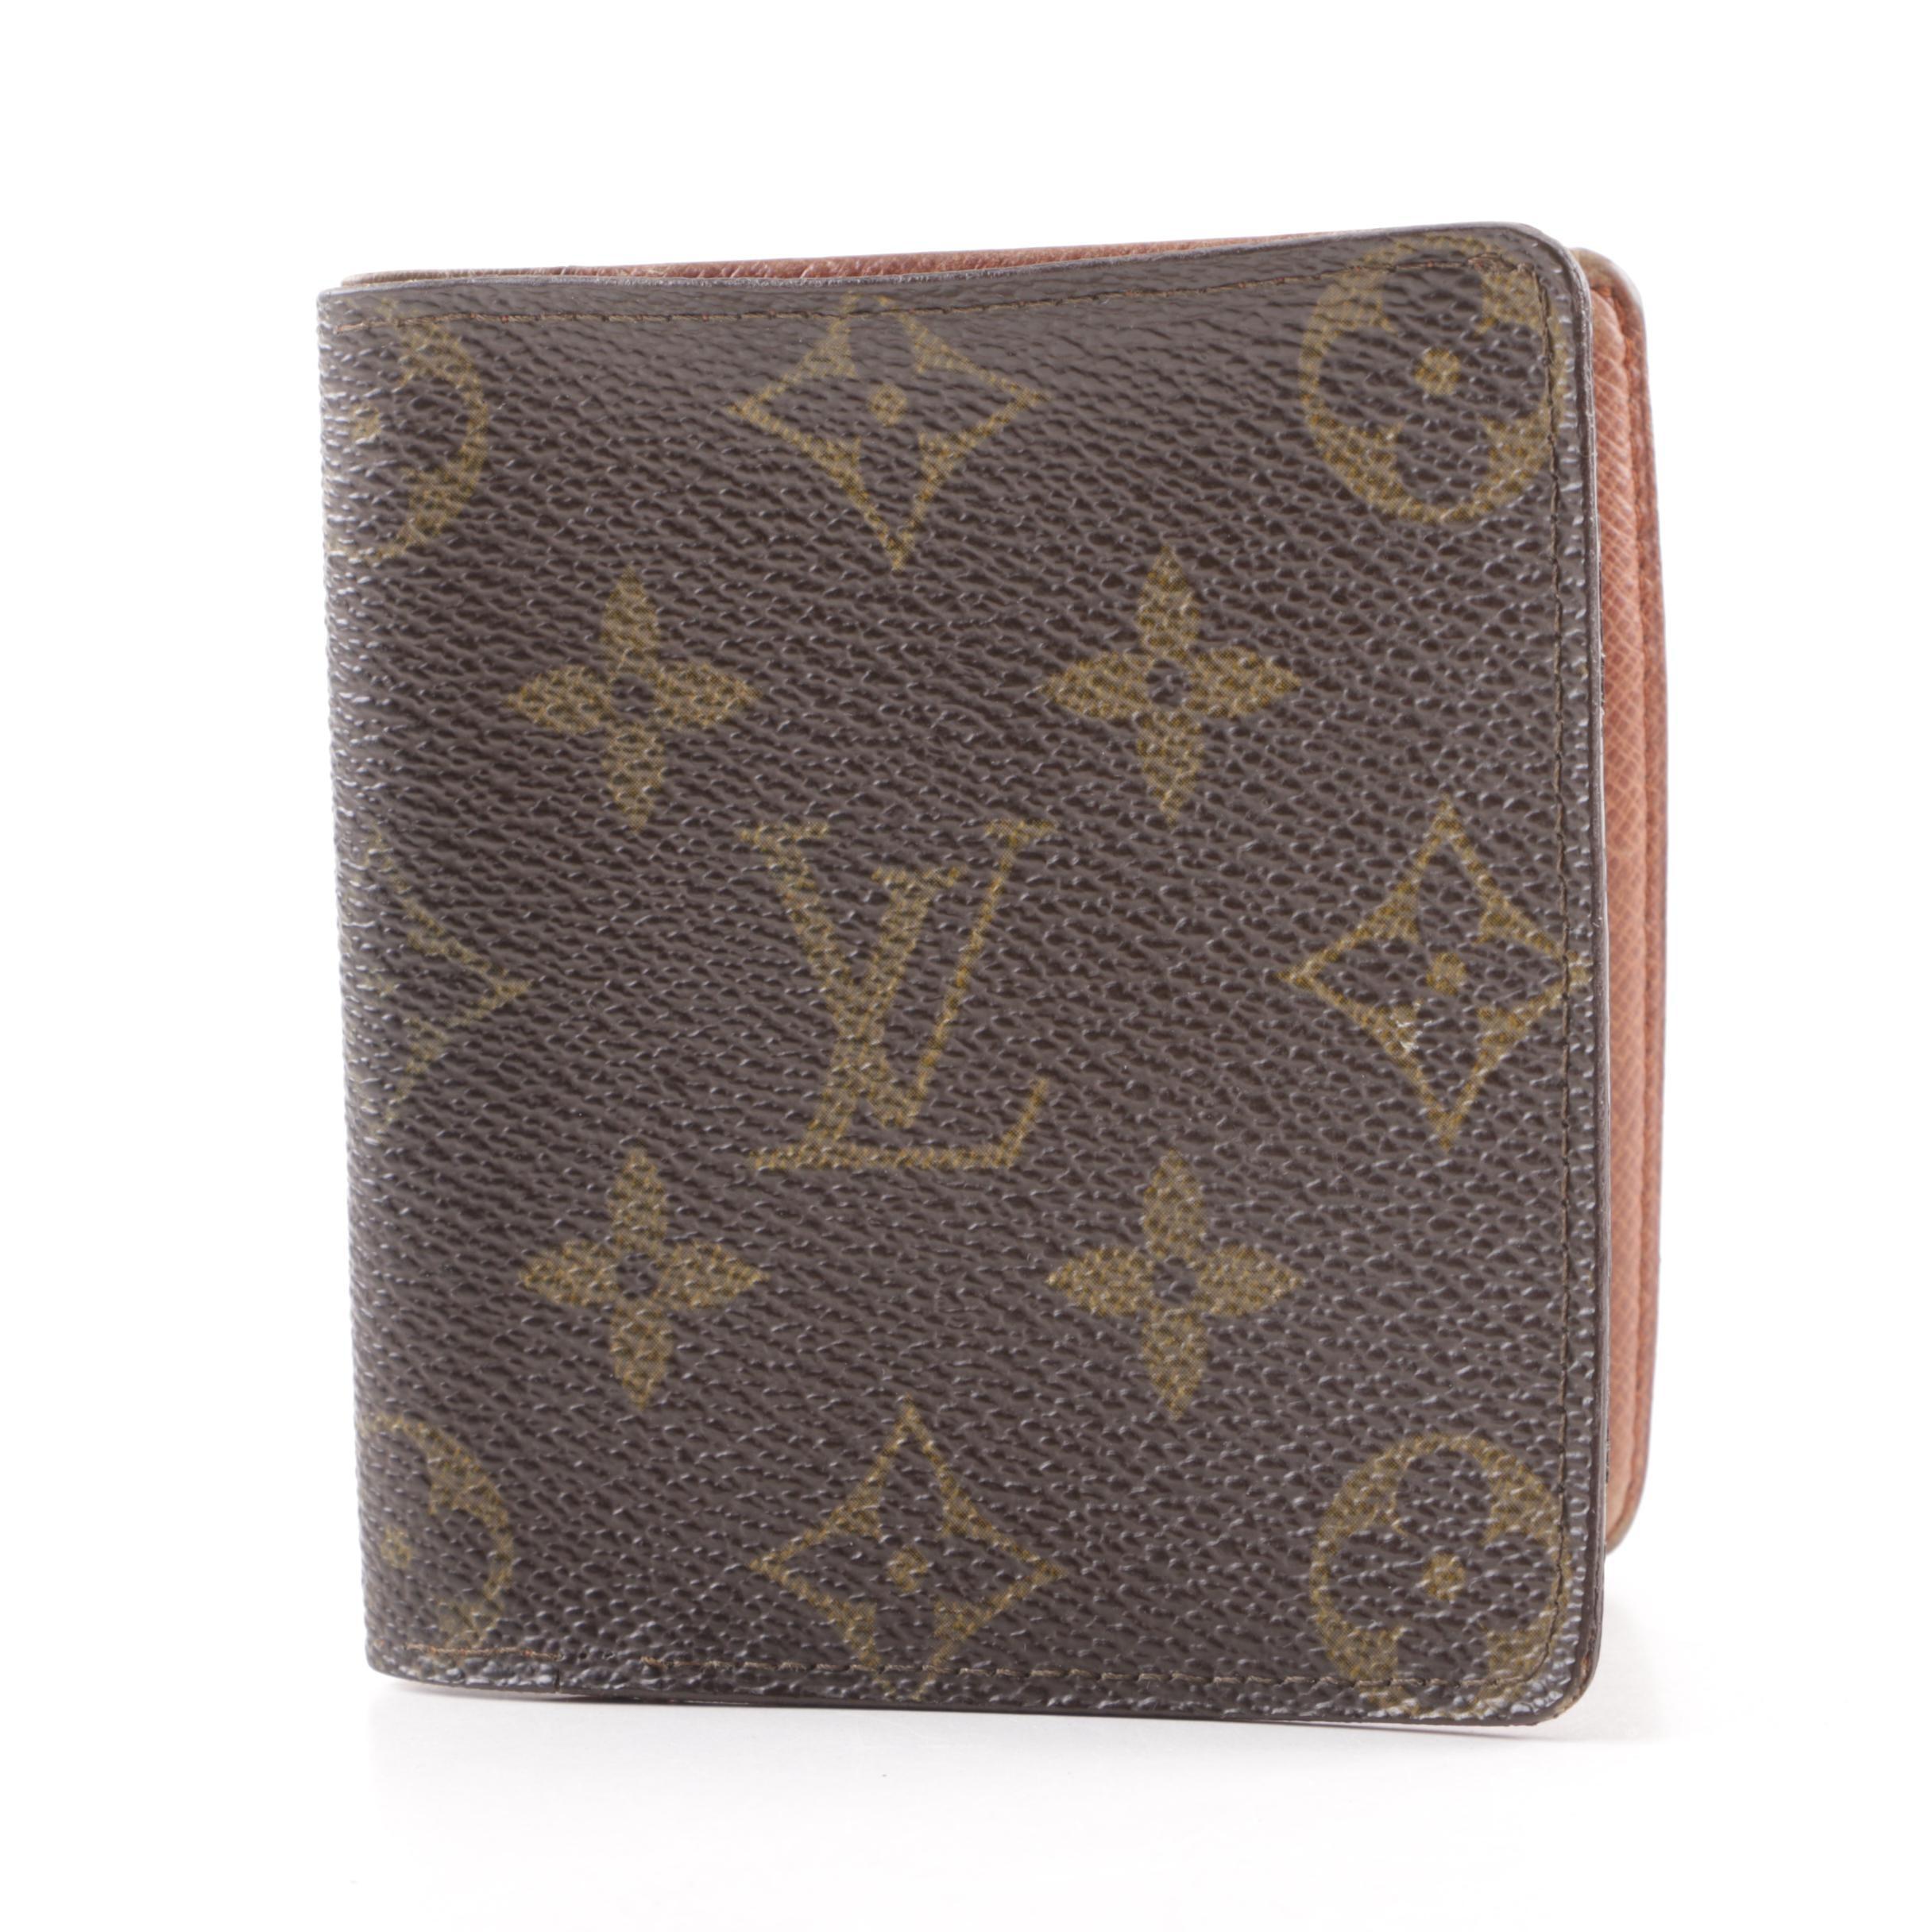 1991 Vintage Louis Vuitton Monogram Canvas Bifold Wallet